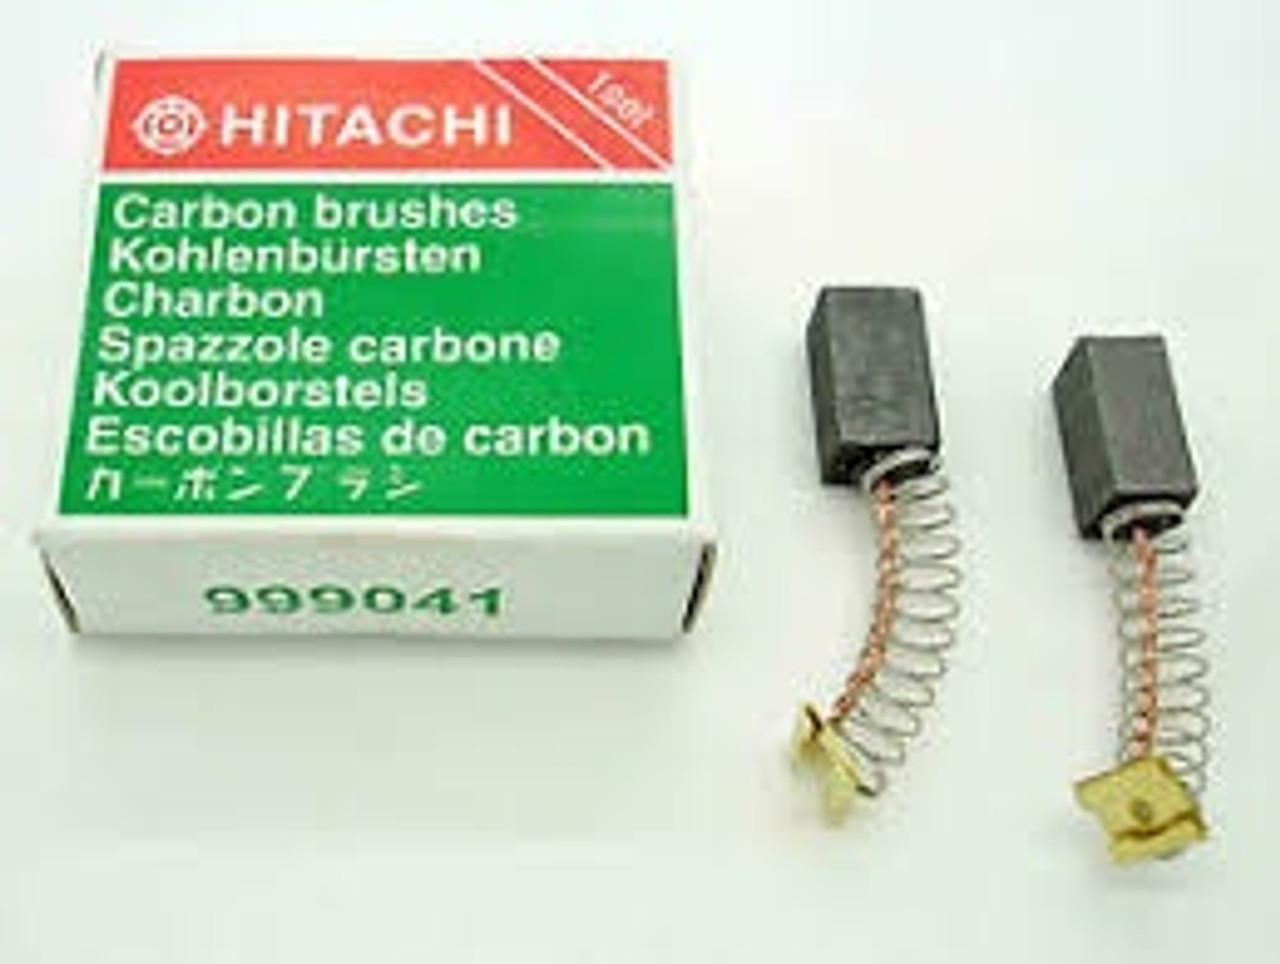 999041 Hitachi Carbon Brushes